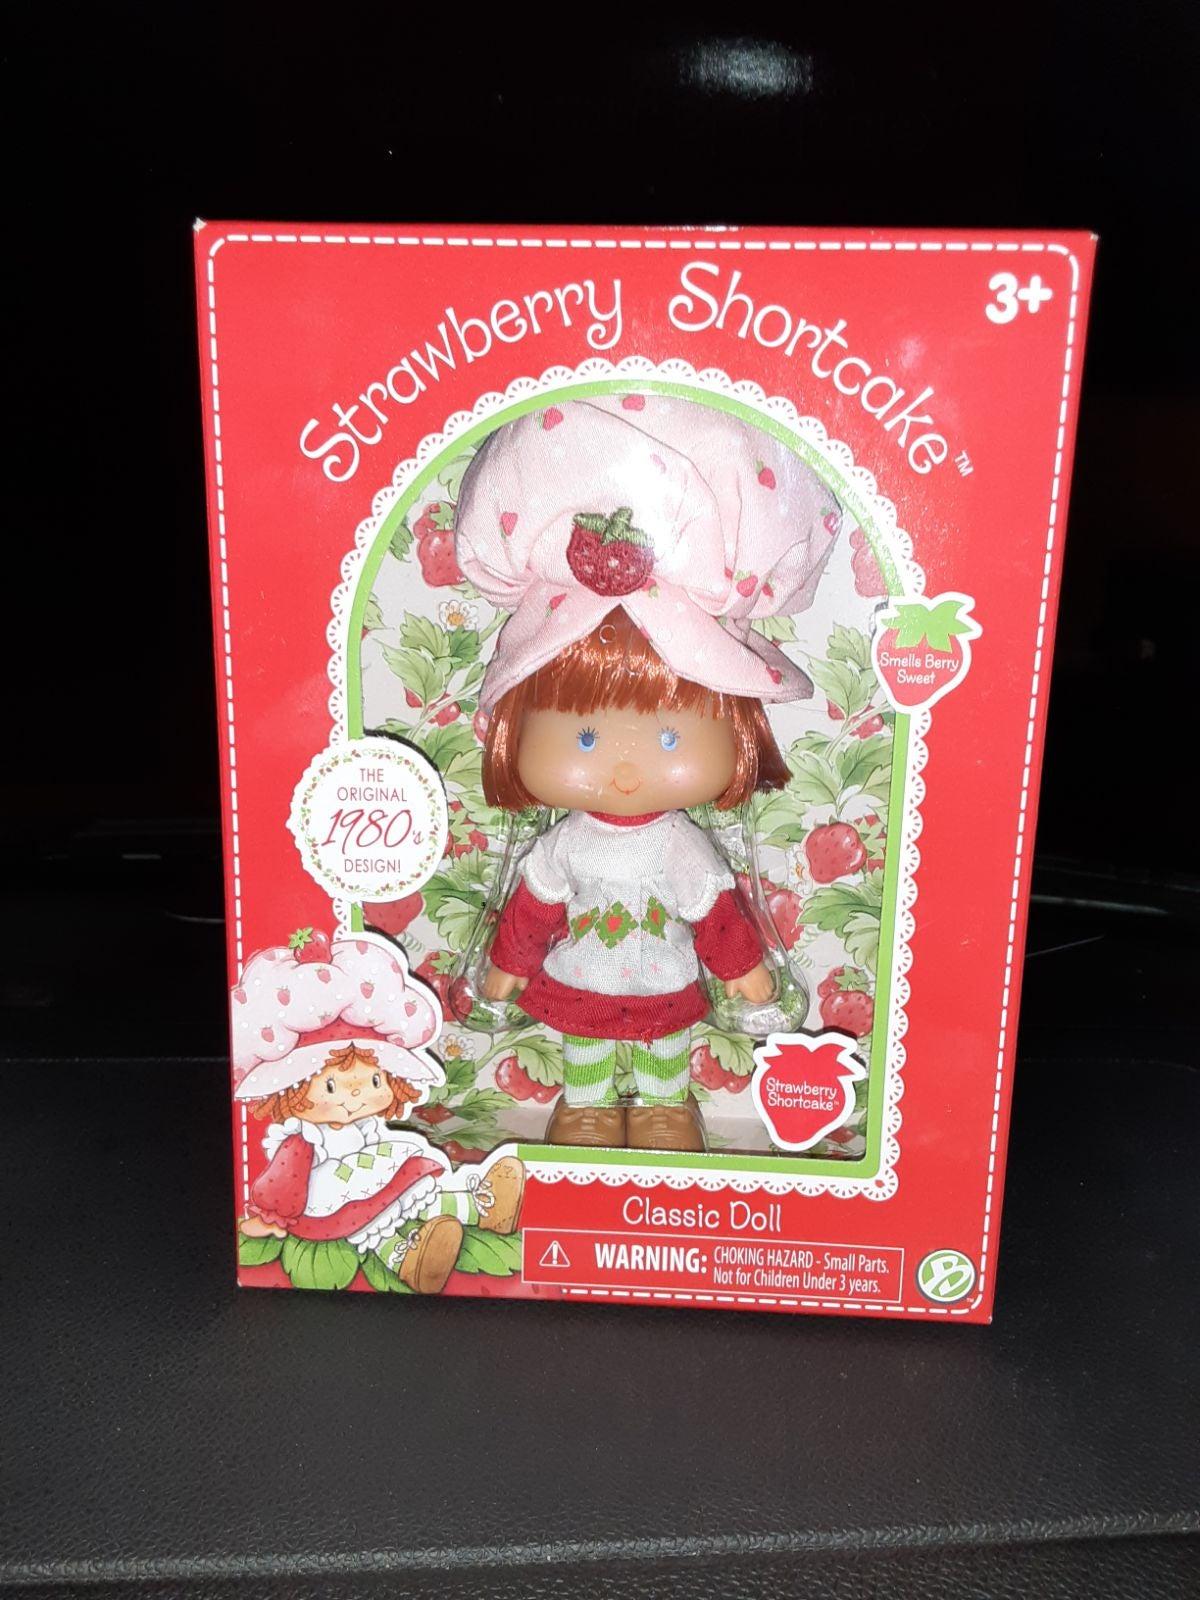 Strawberry Shortcake Classic Doll